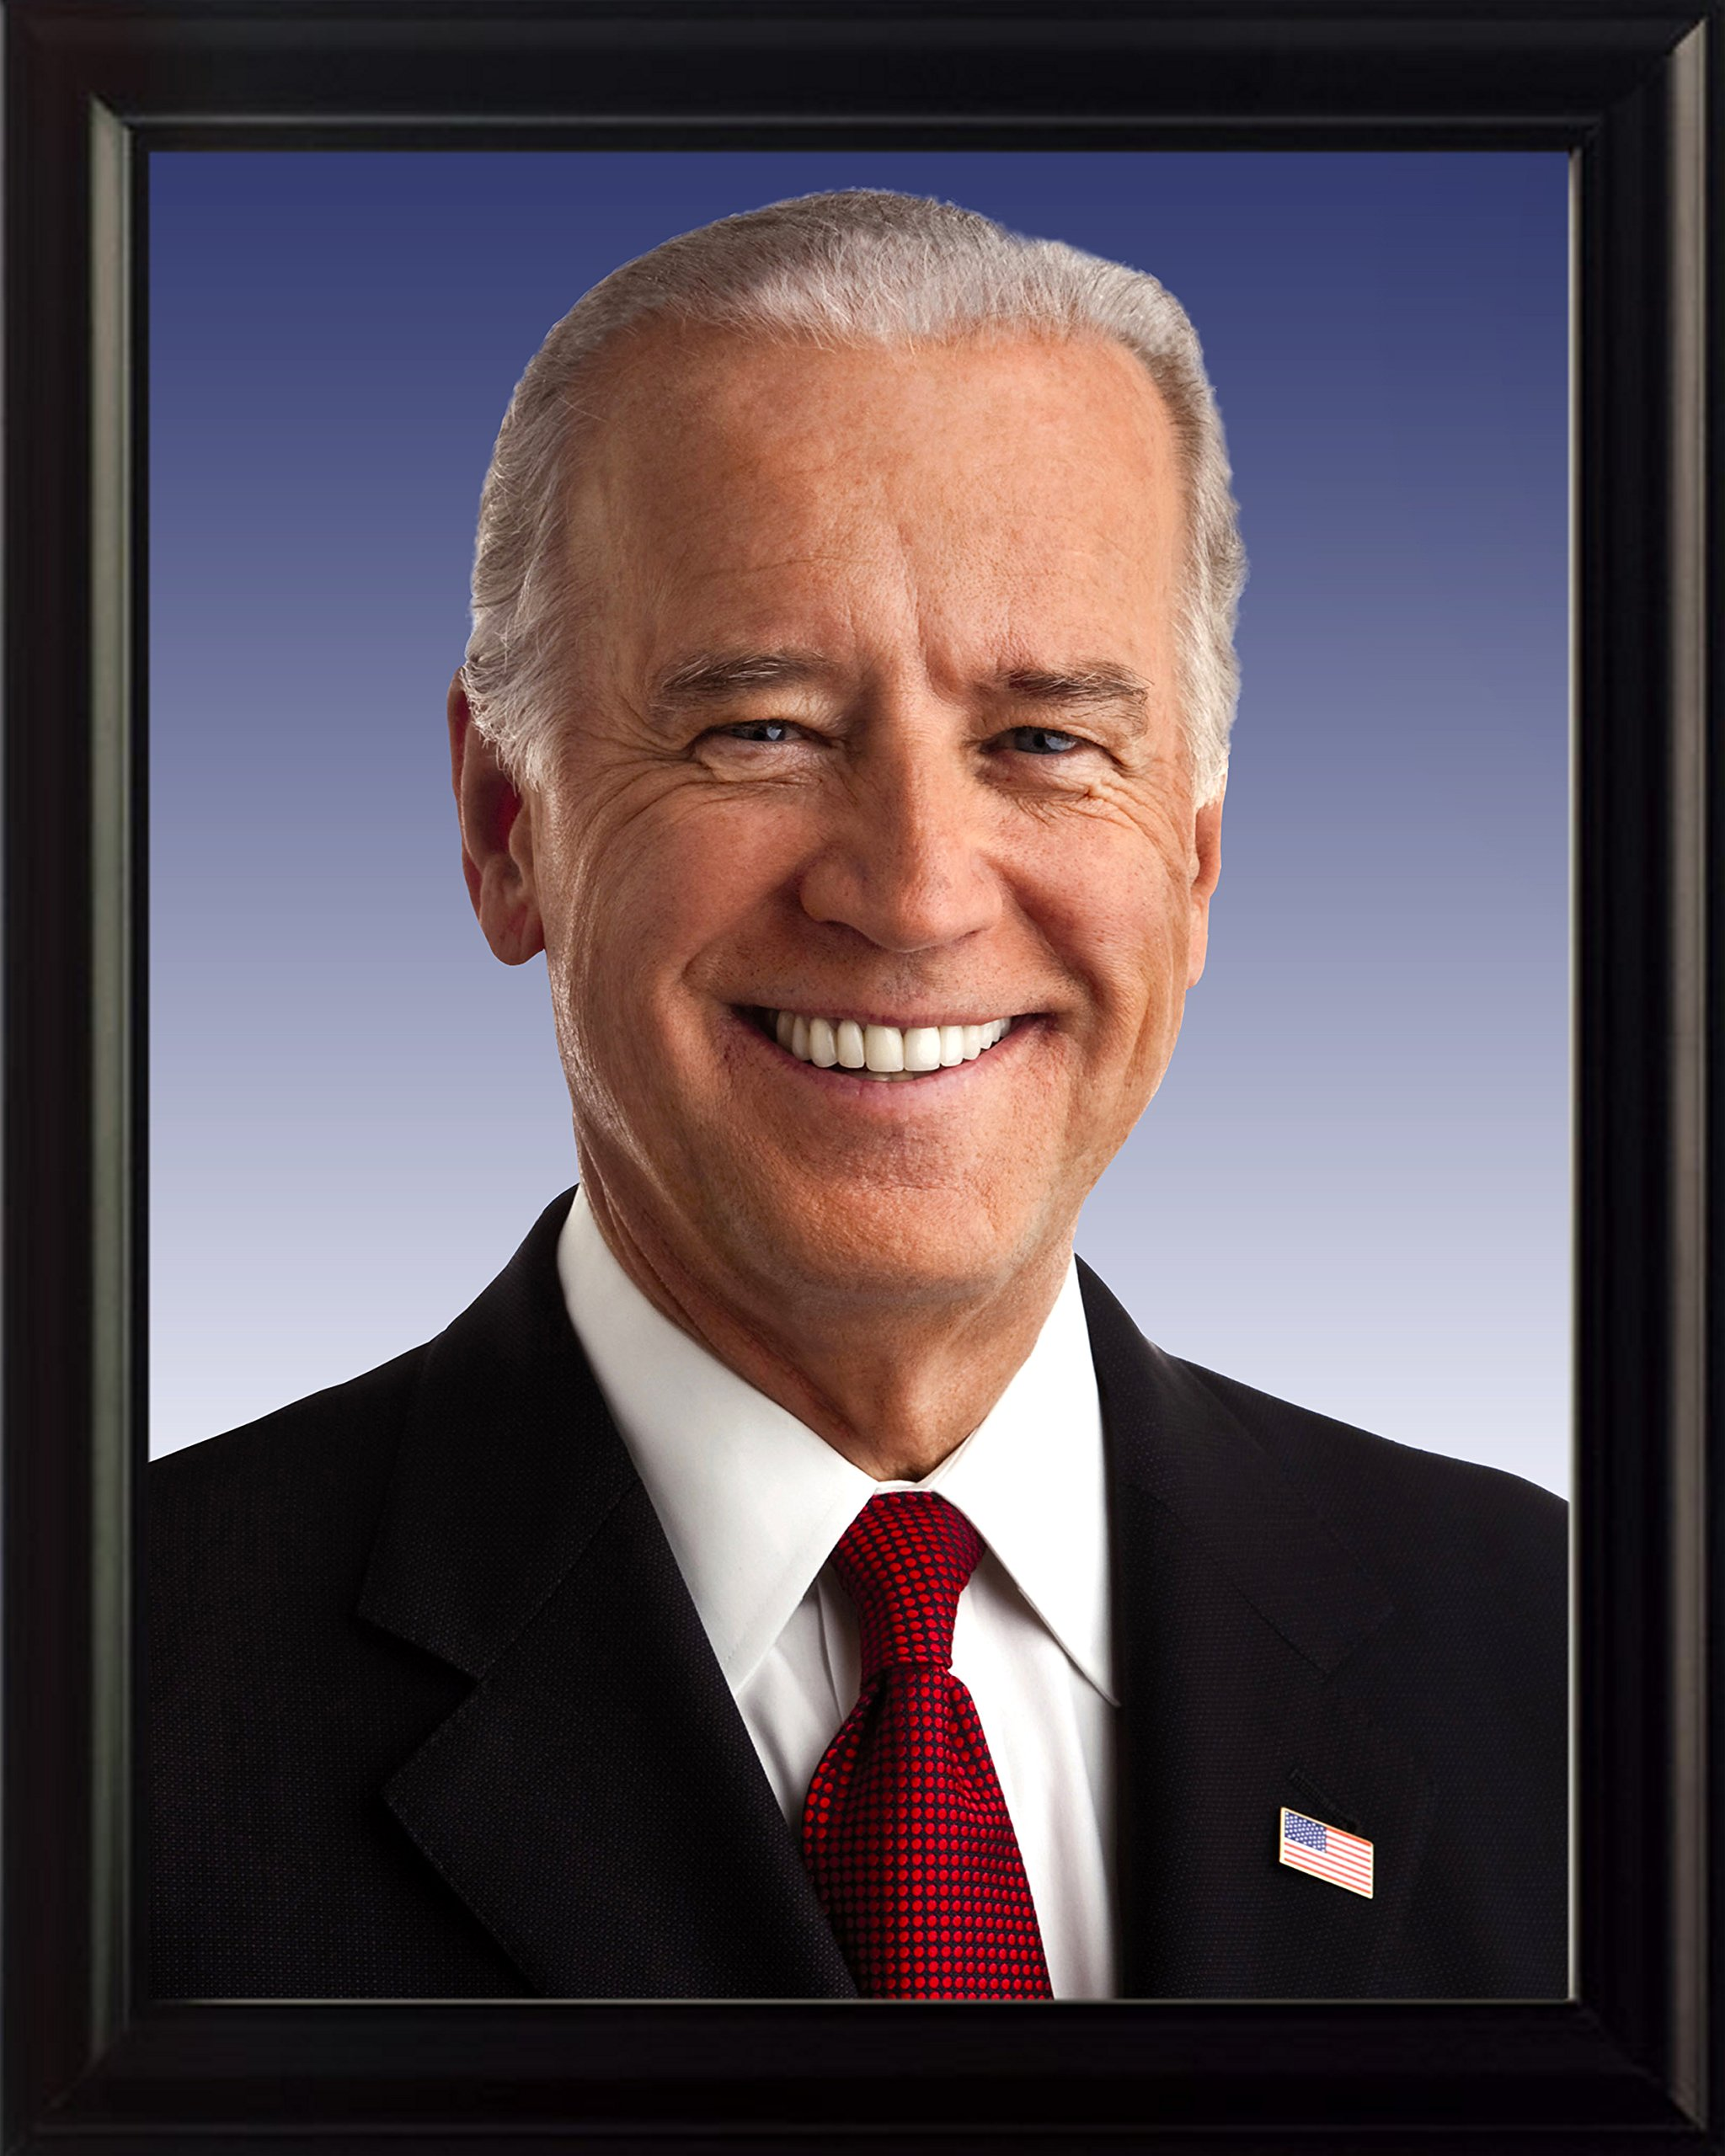 Joe Biden 8x10 Framed Photo